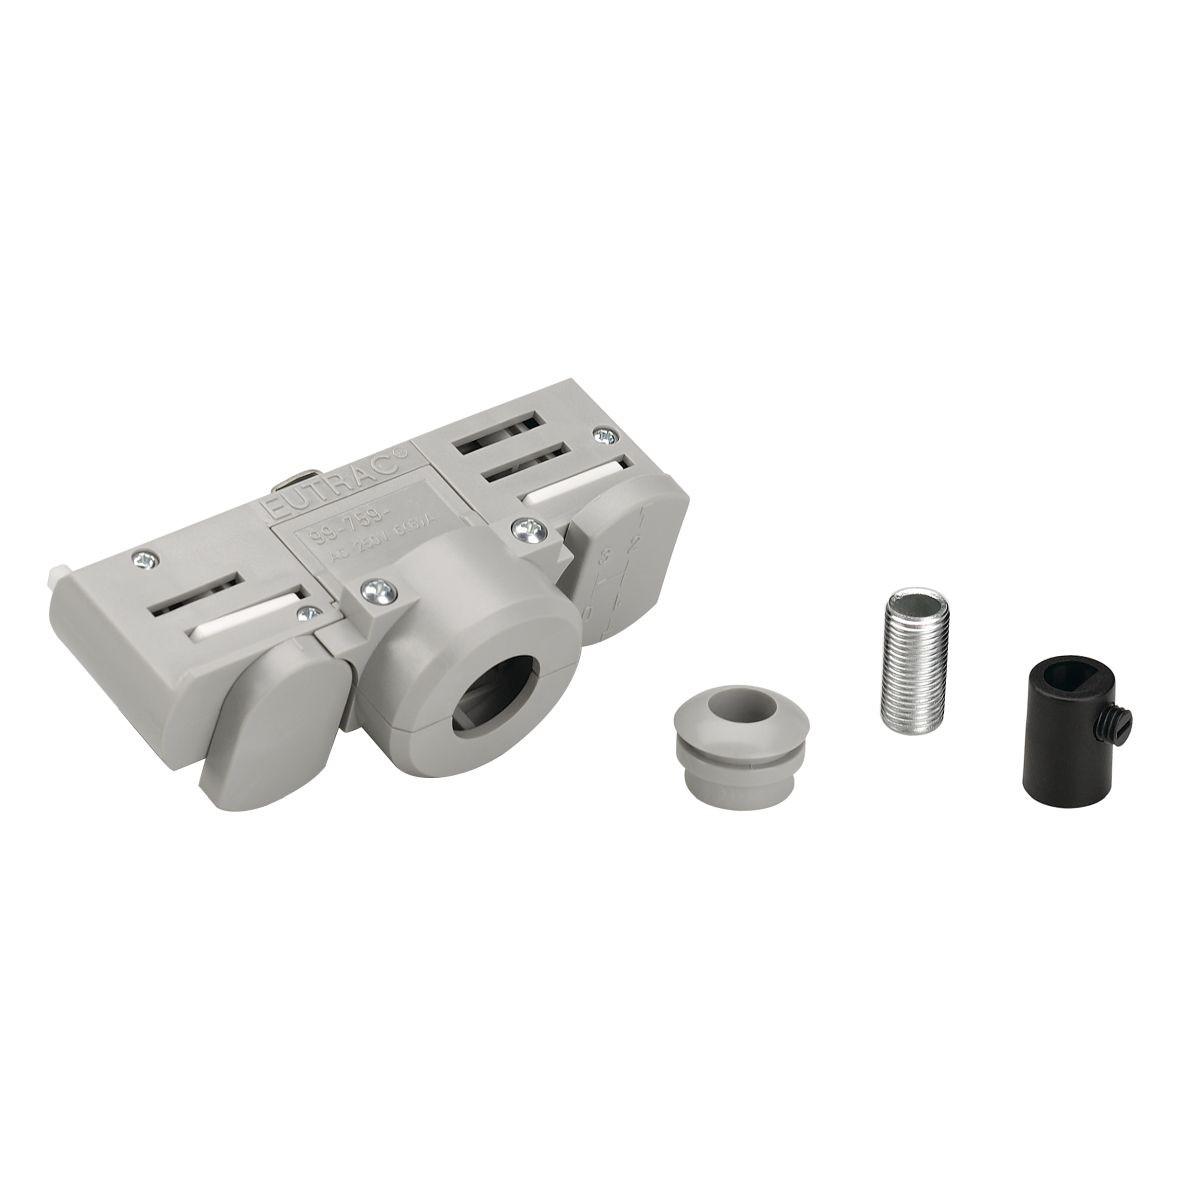 SPOTLINE/SLV EUTRAC adapter do szyny 3-fazowej. szary 145994